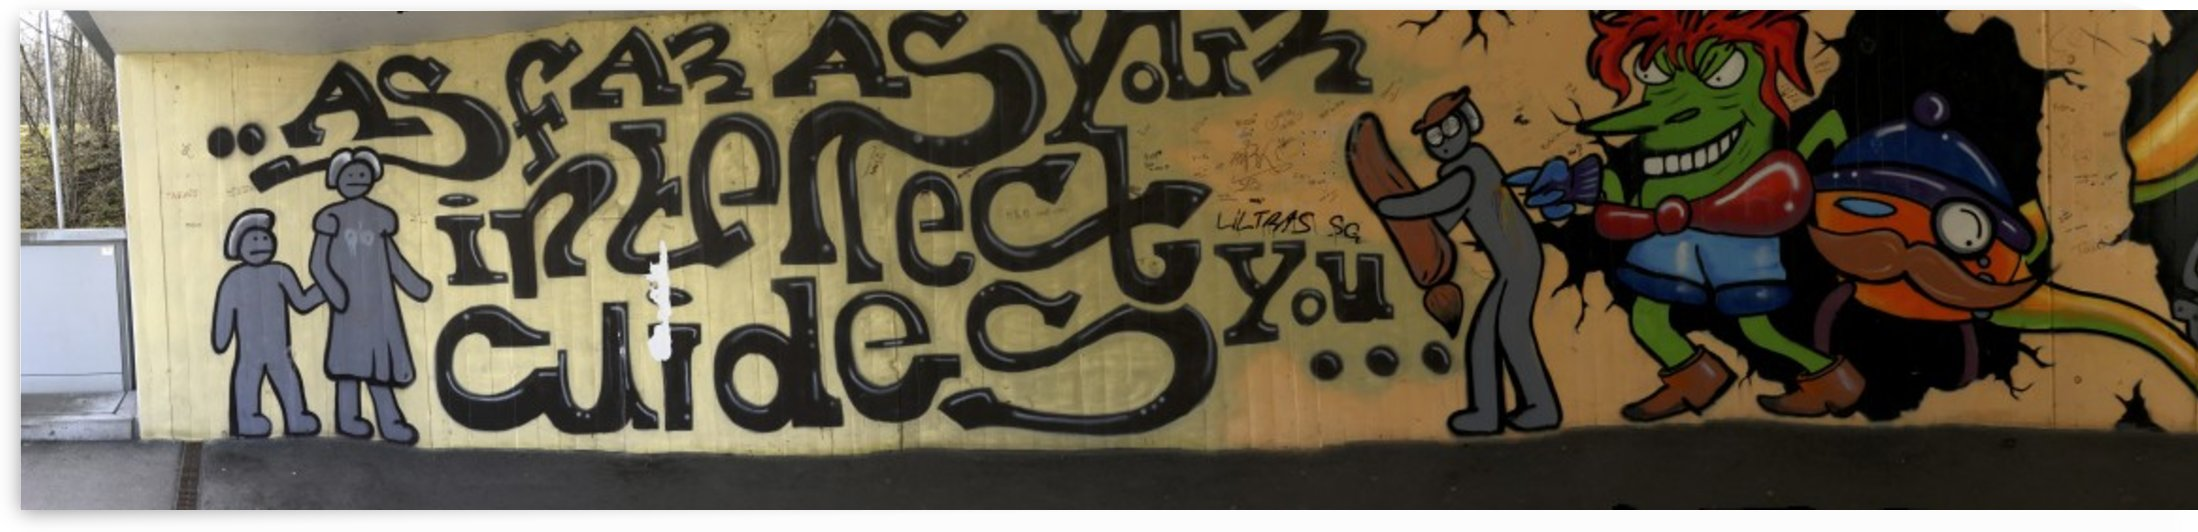 Underpass Creative Graffiti Art I by Swiss Art by Patrick Kobler